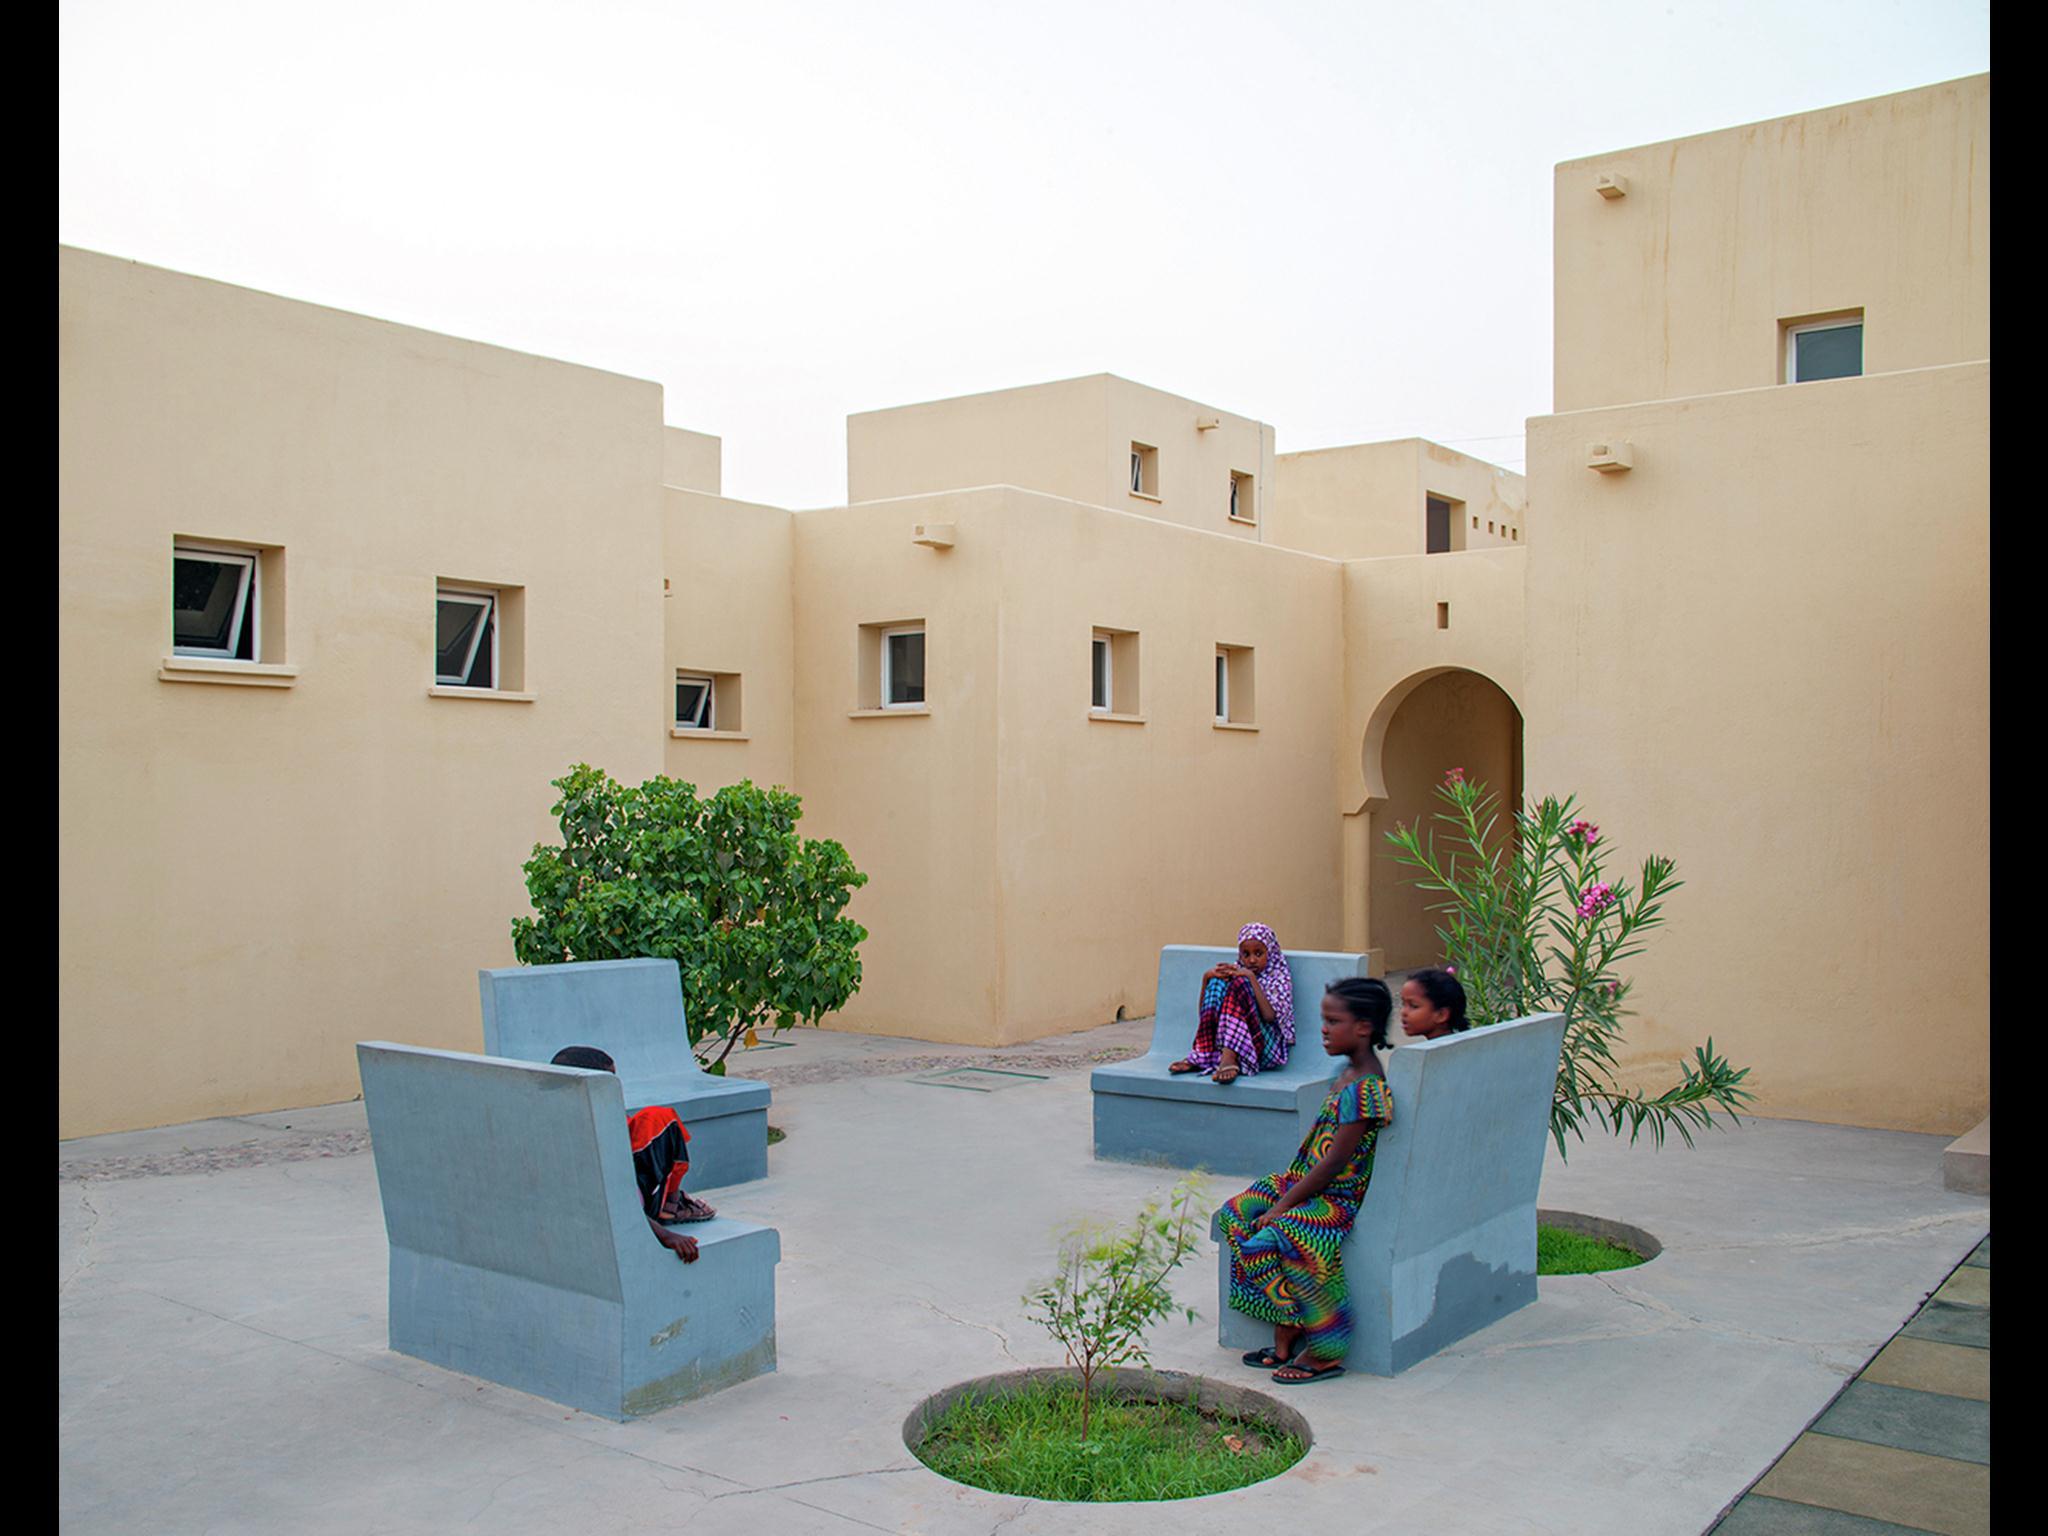 SOS_Village_Djibouti_-_Squares_(10)